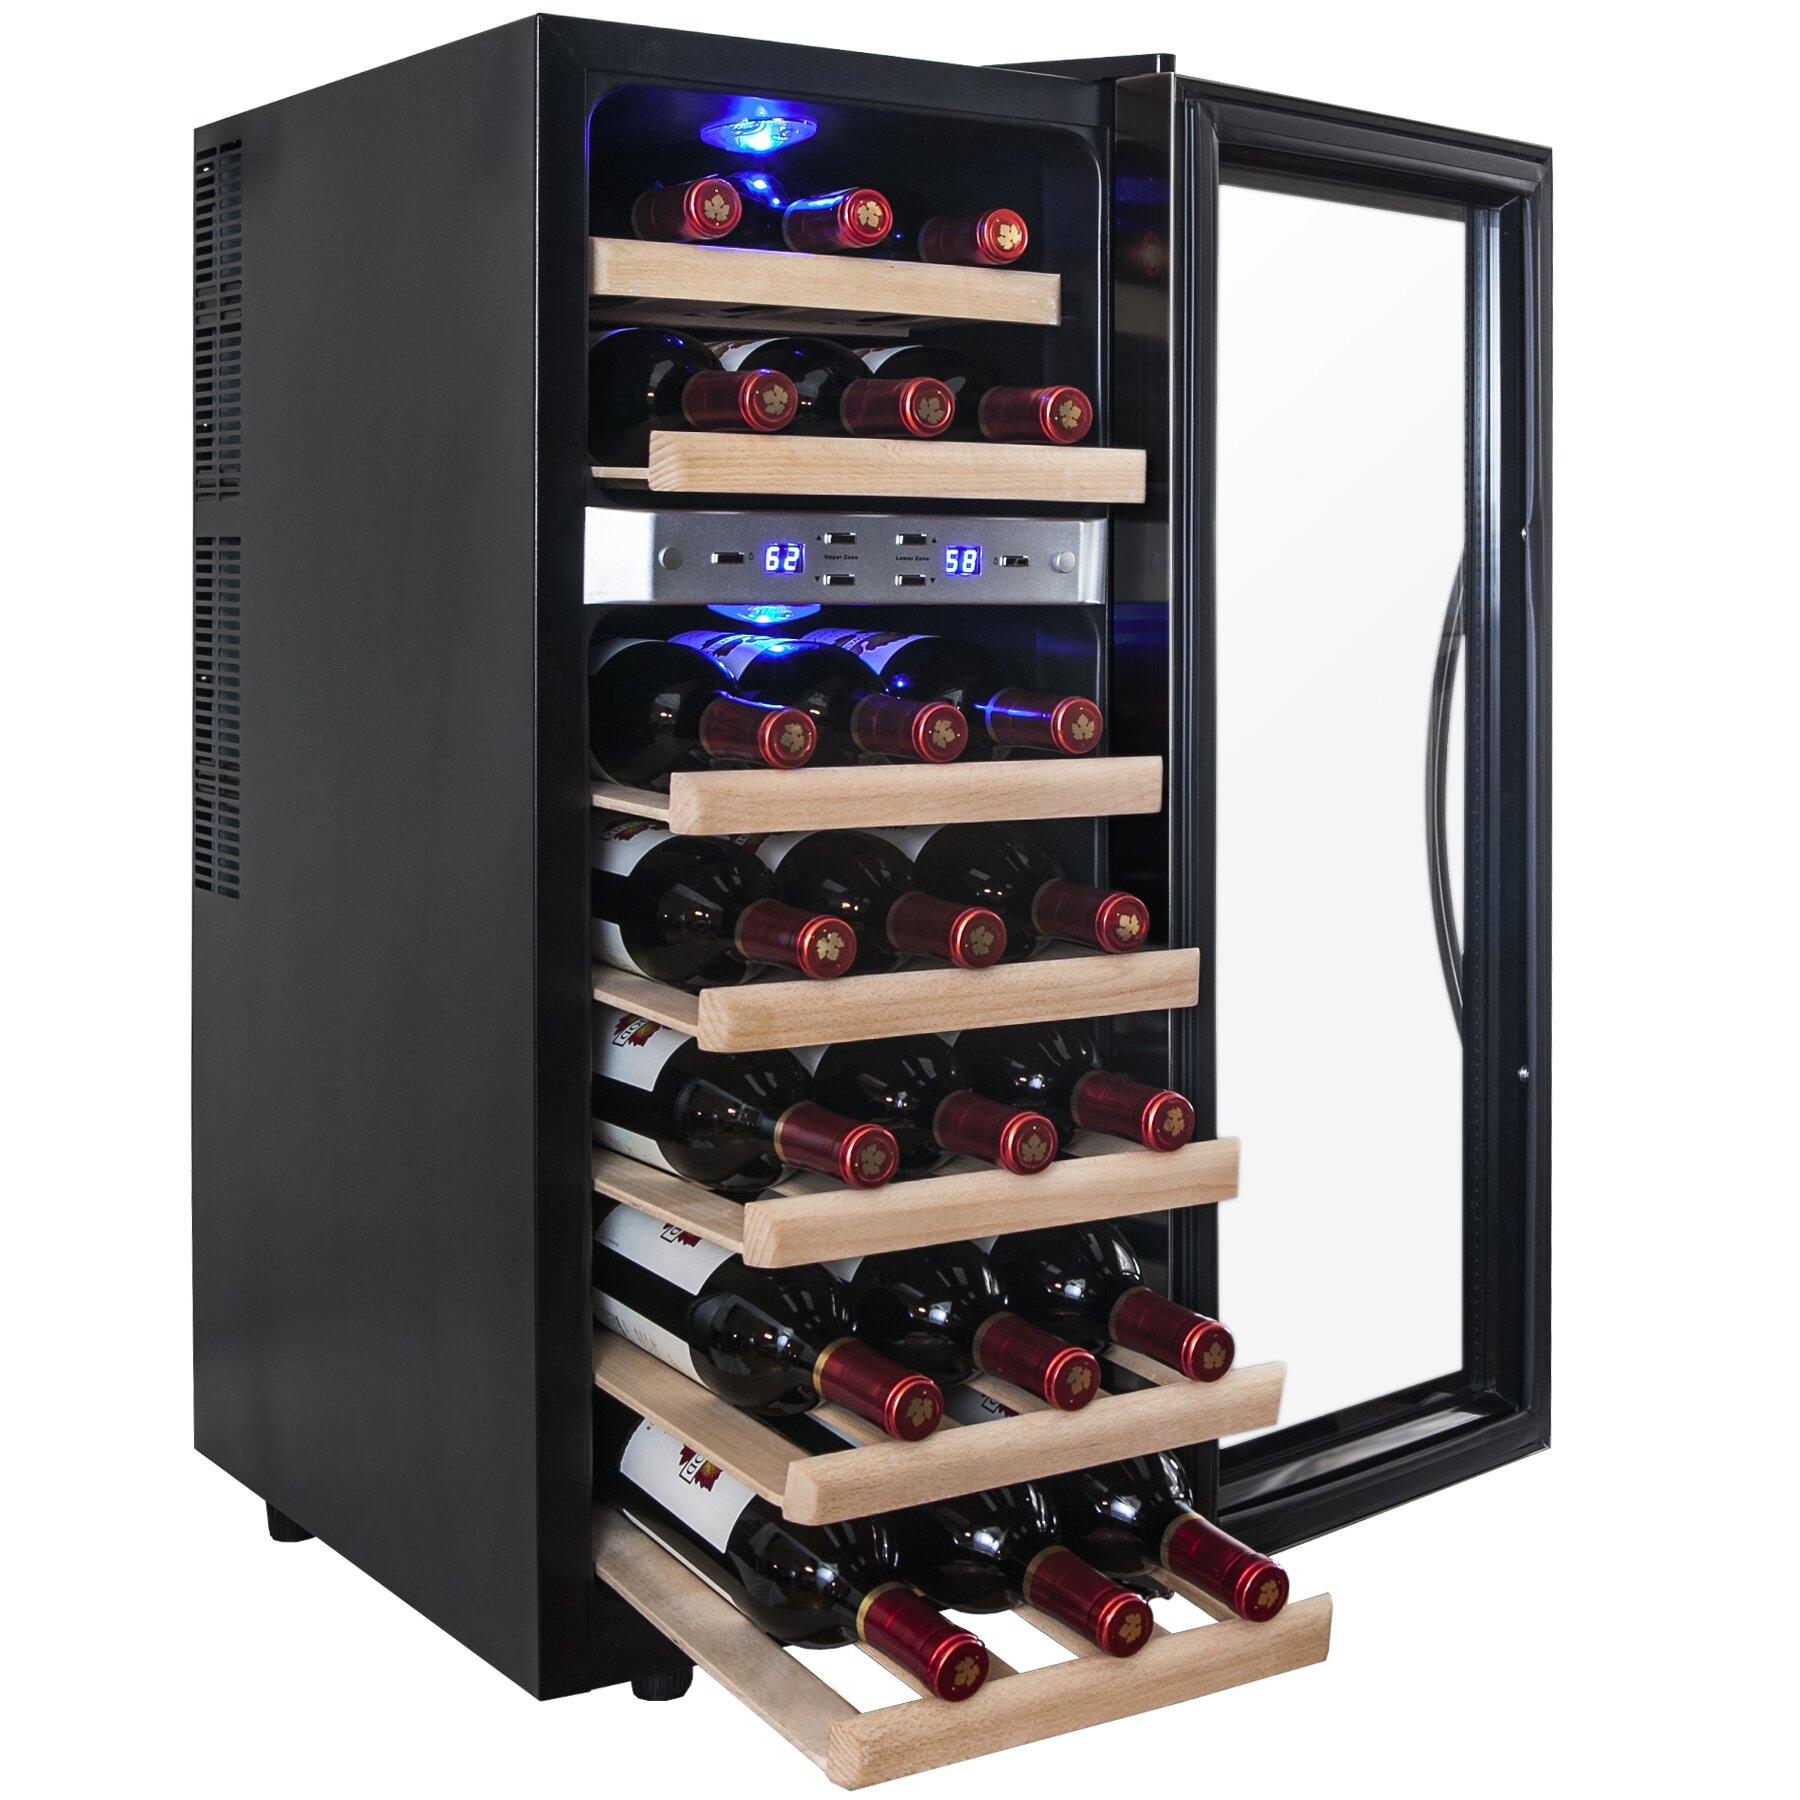 akdy 21 bottle dual zone freestanding wine refrigerator reviews wayfair. Black Bedroom Furniture Sets. Home Design Ideas